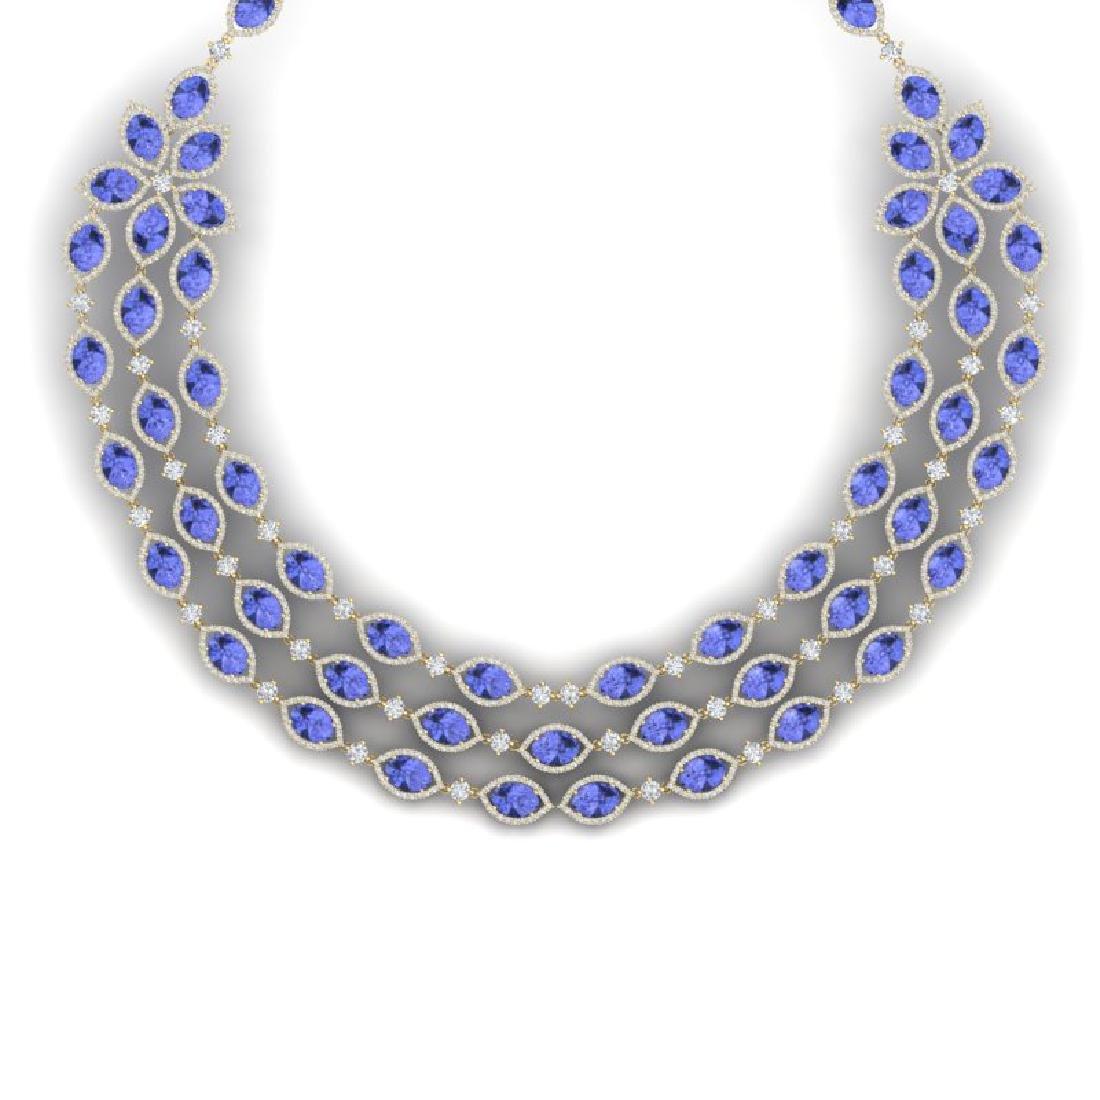 79.33 CTW Royalty Tanzanite & VS Diamond Necklace 18K - 2